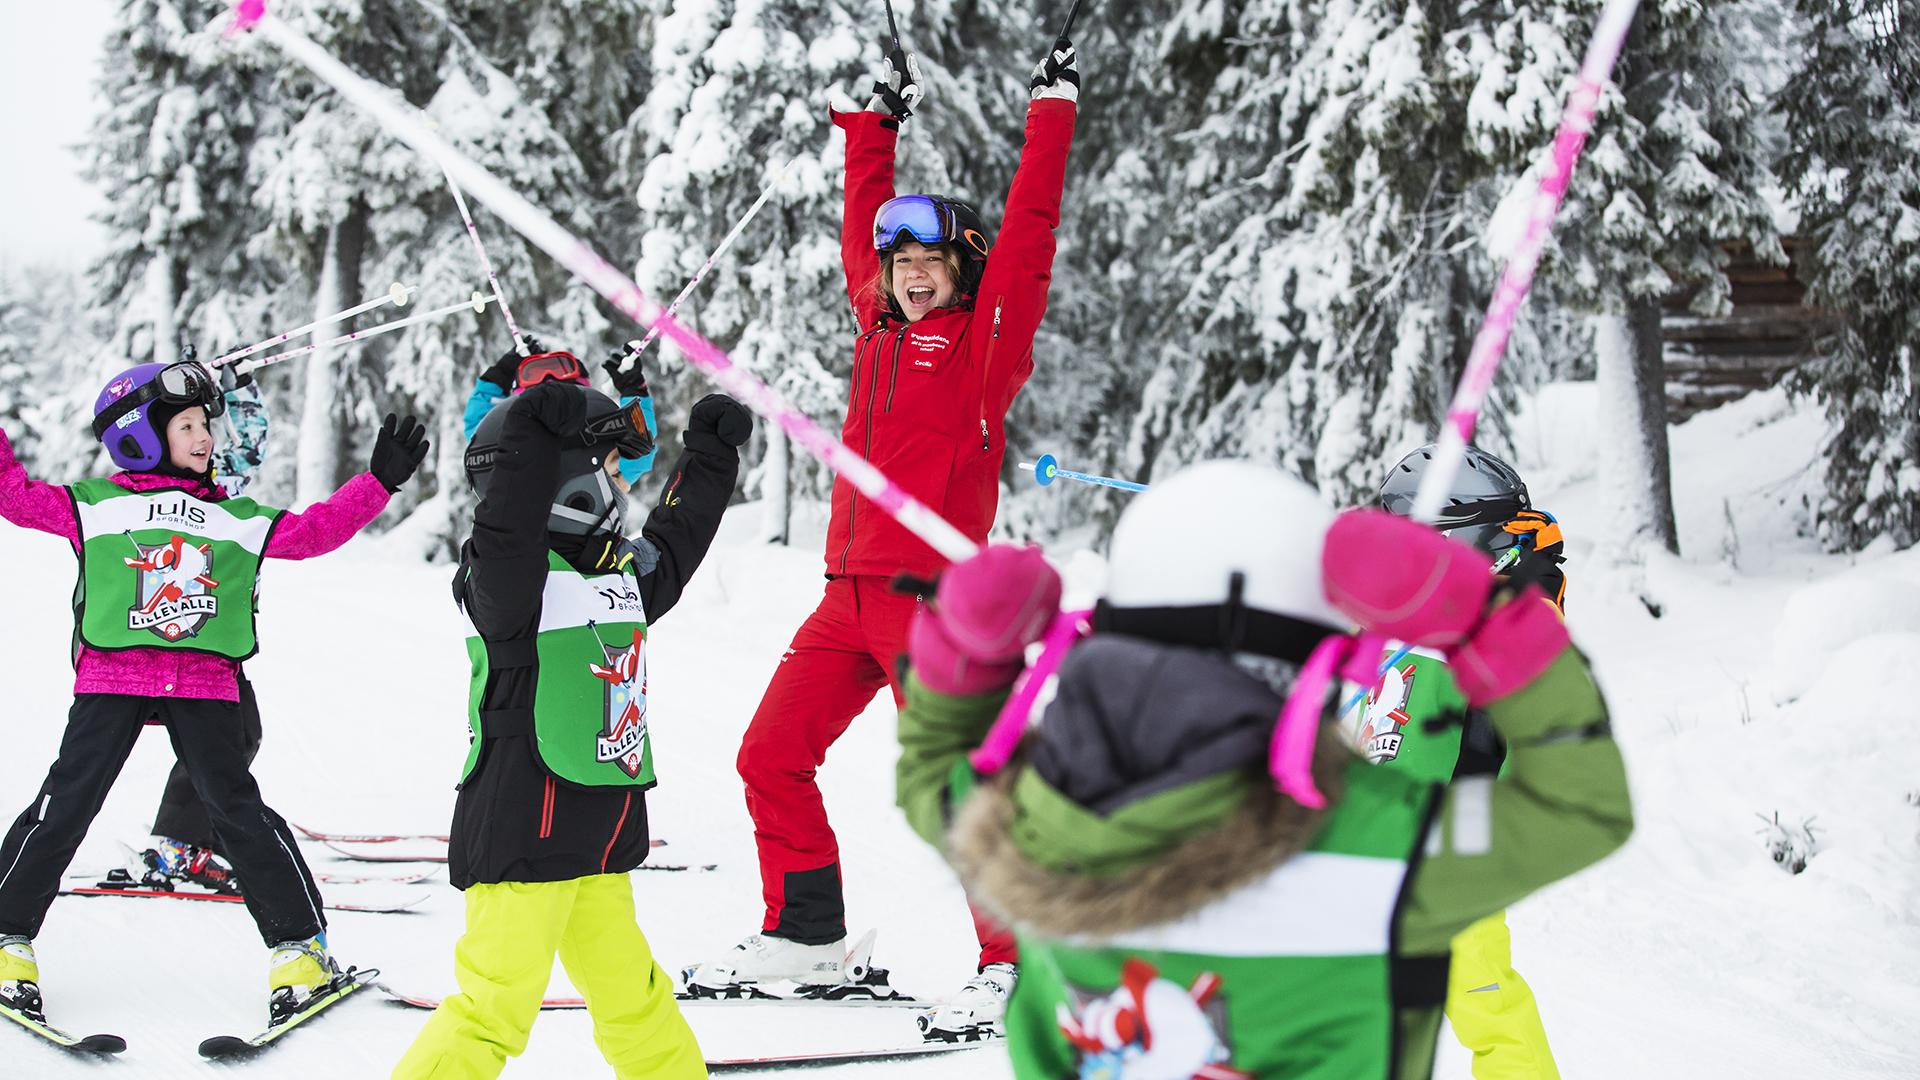 Valles skiskole